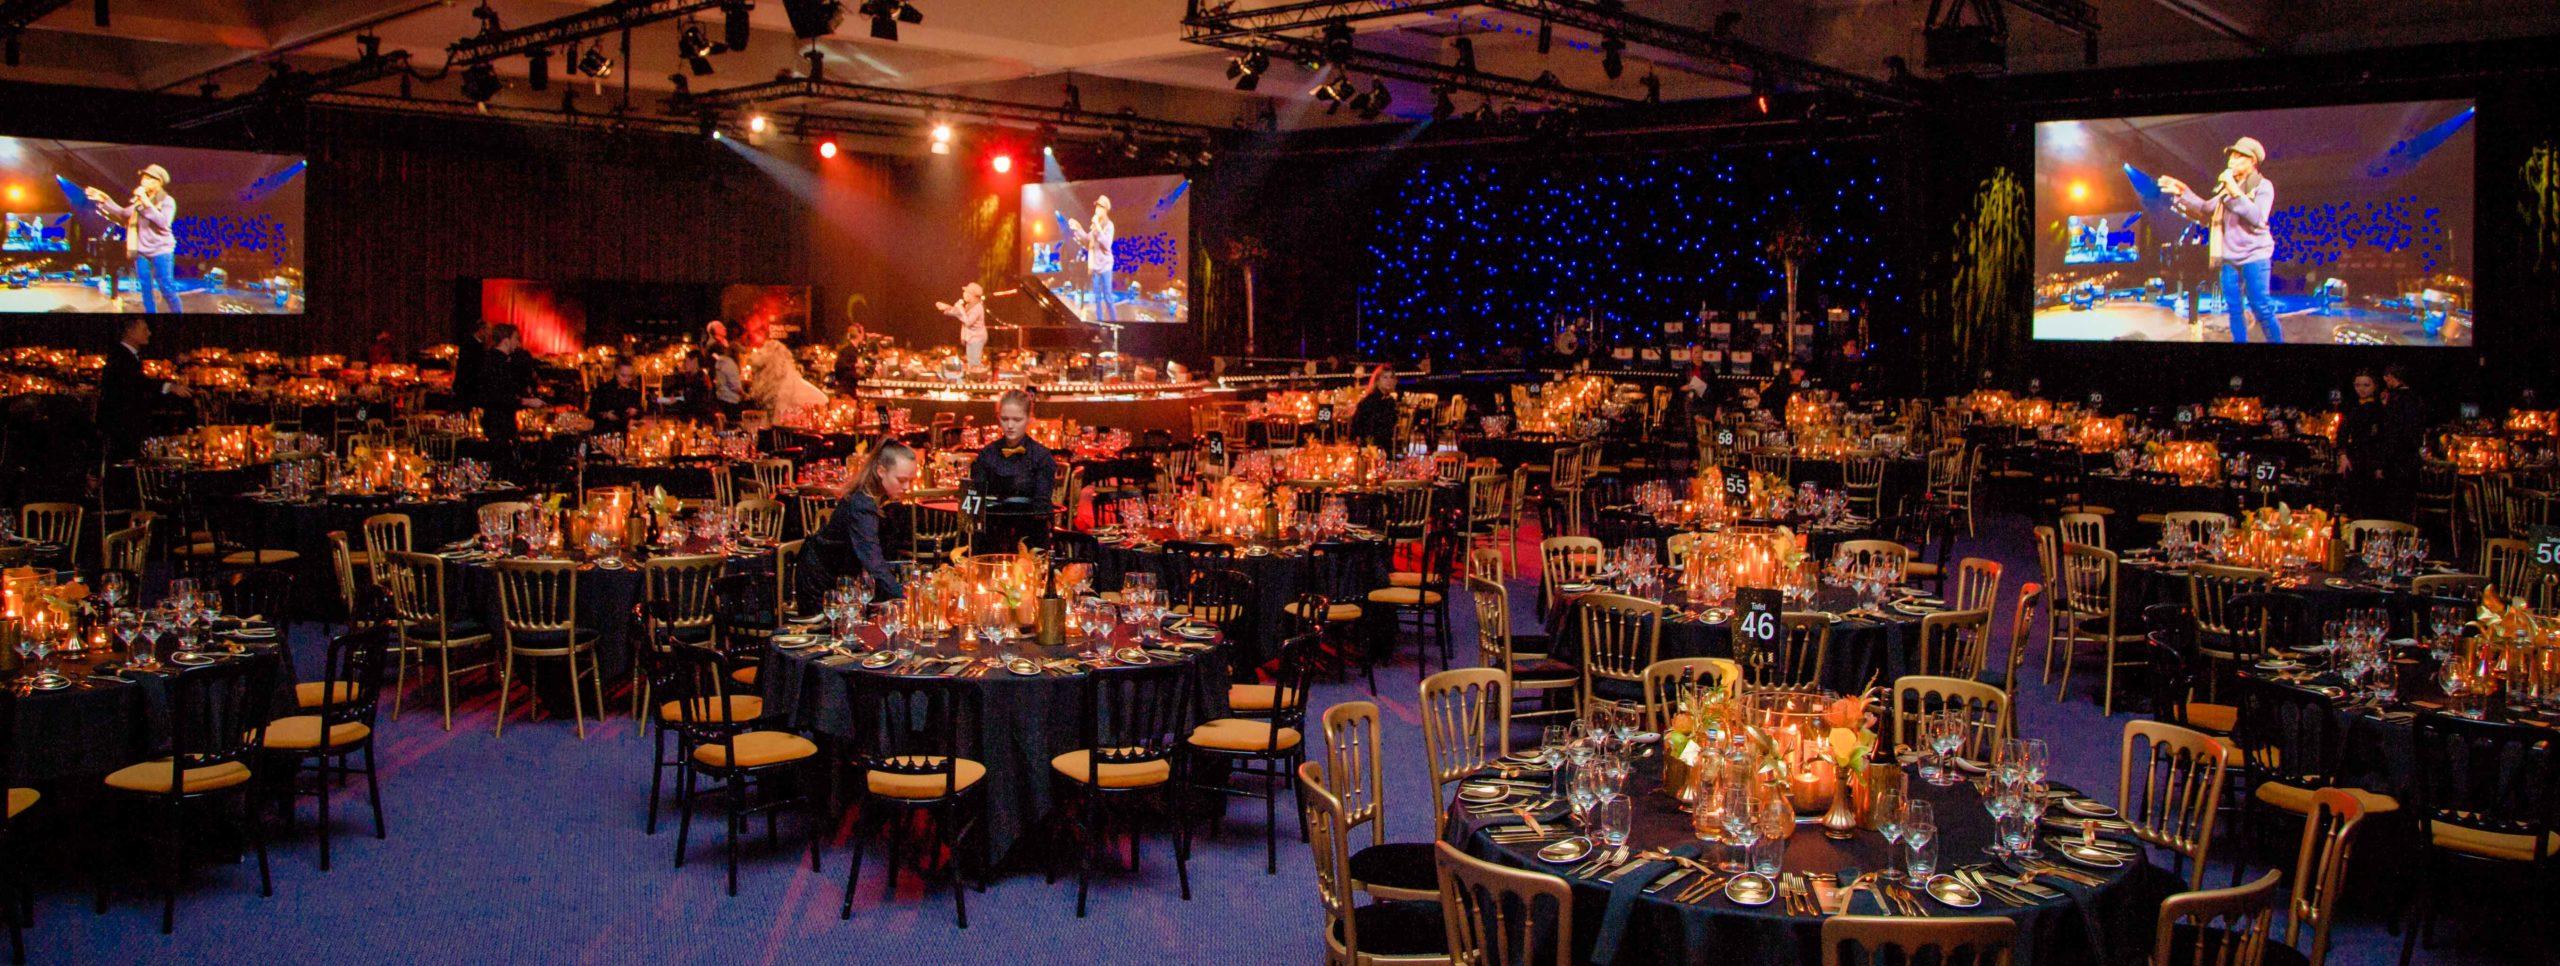 gala diner fotograaf lege zaal